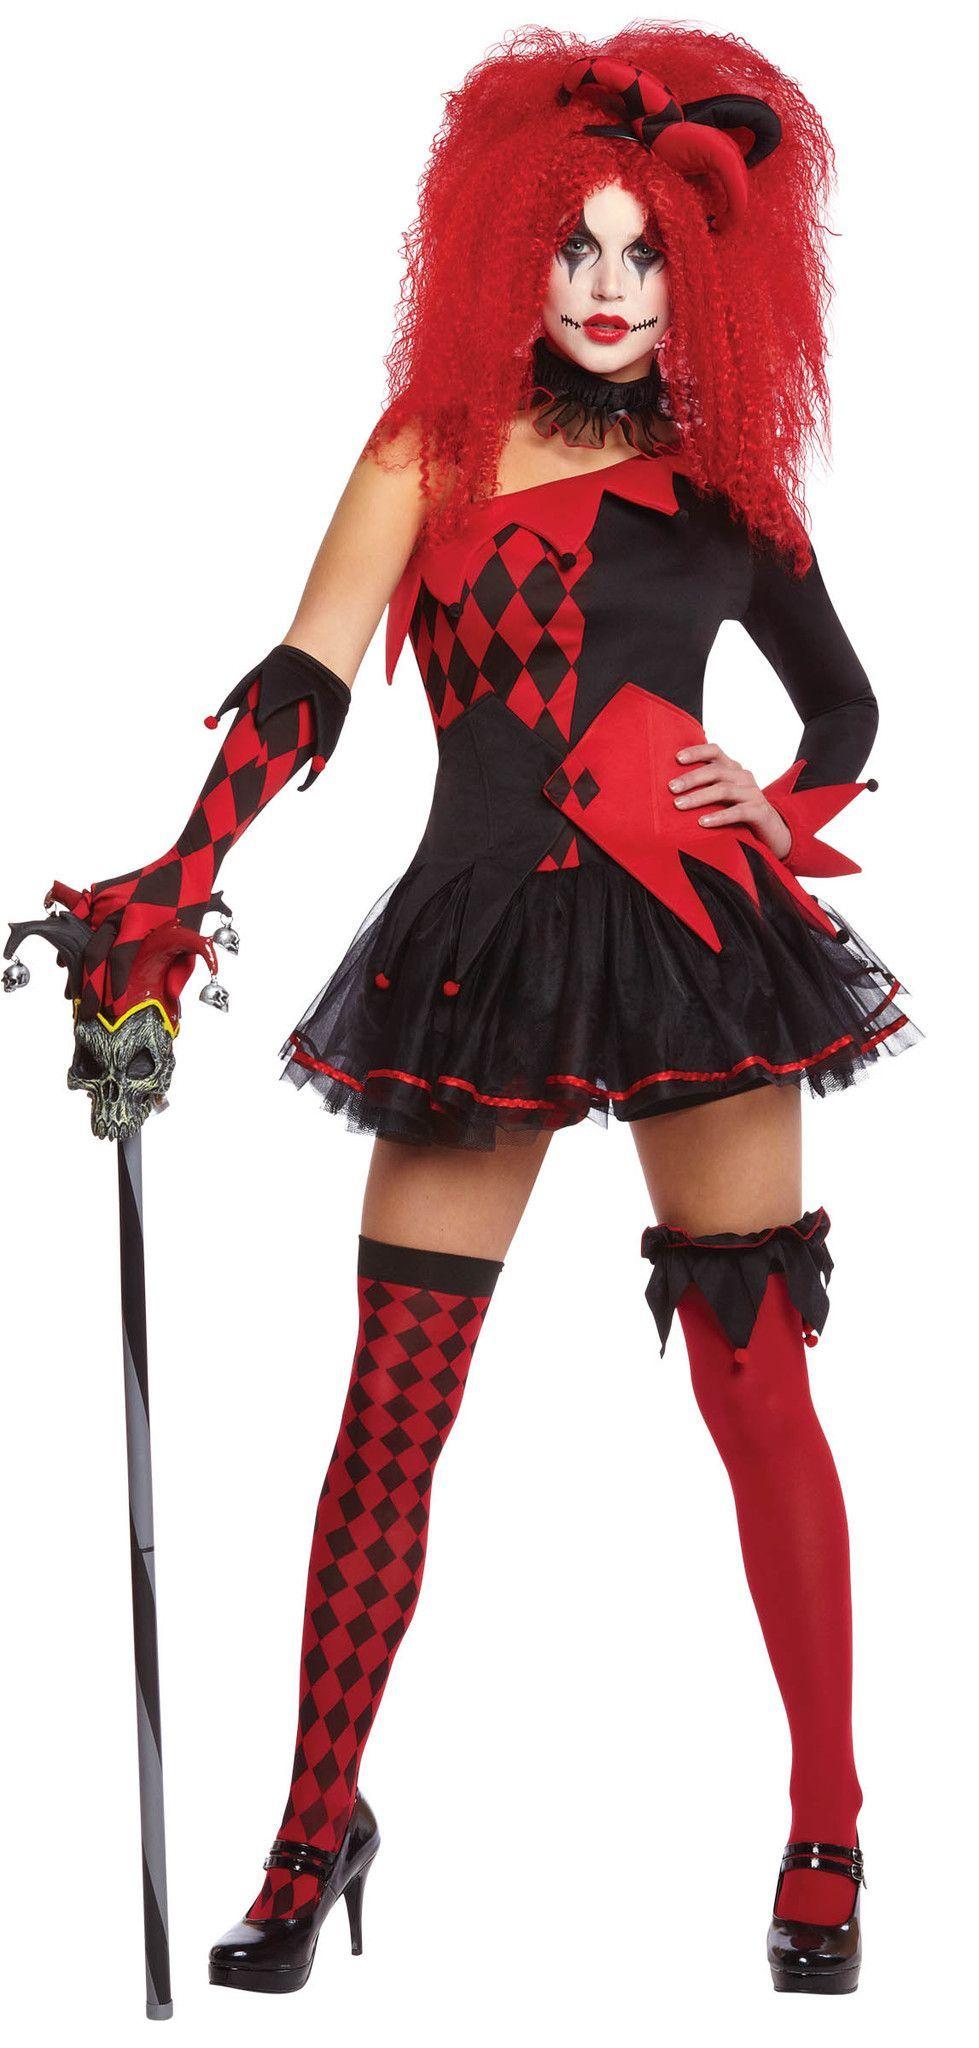 Costume Jesterina Halloween disfraces, Disfraces y